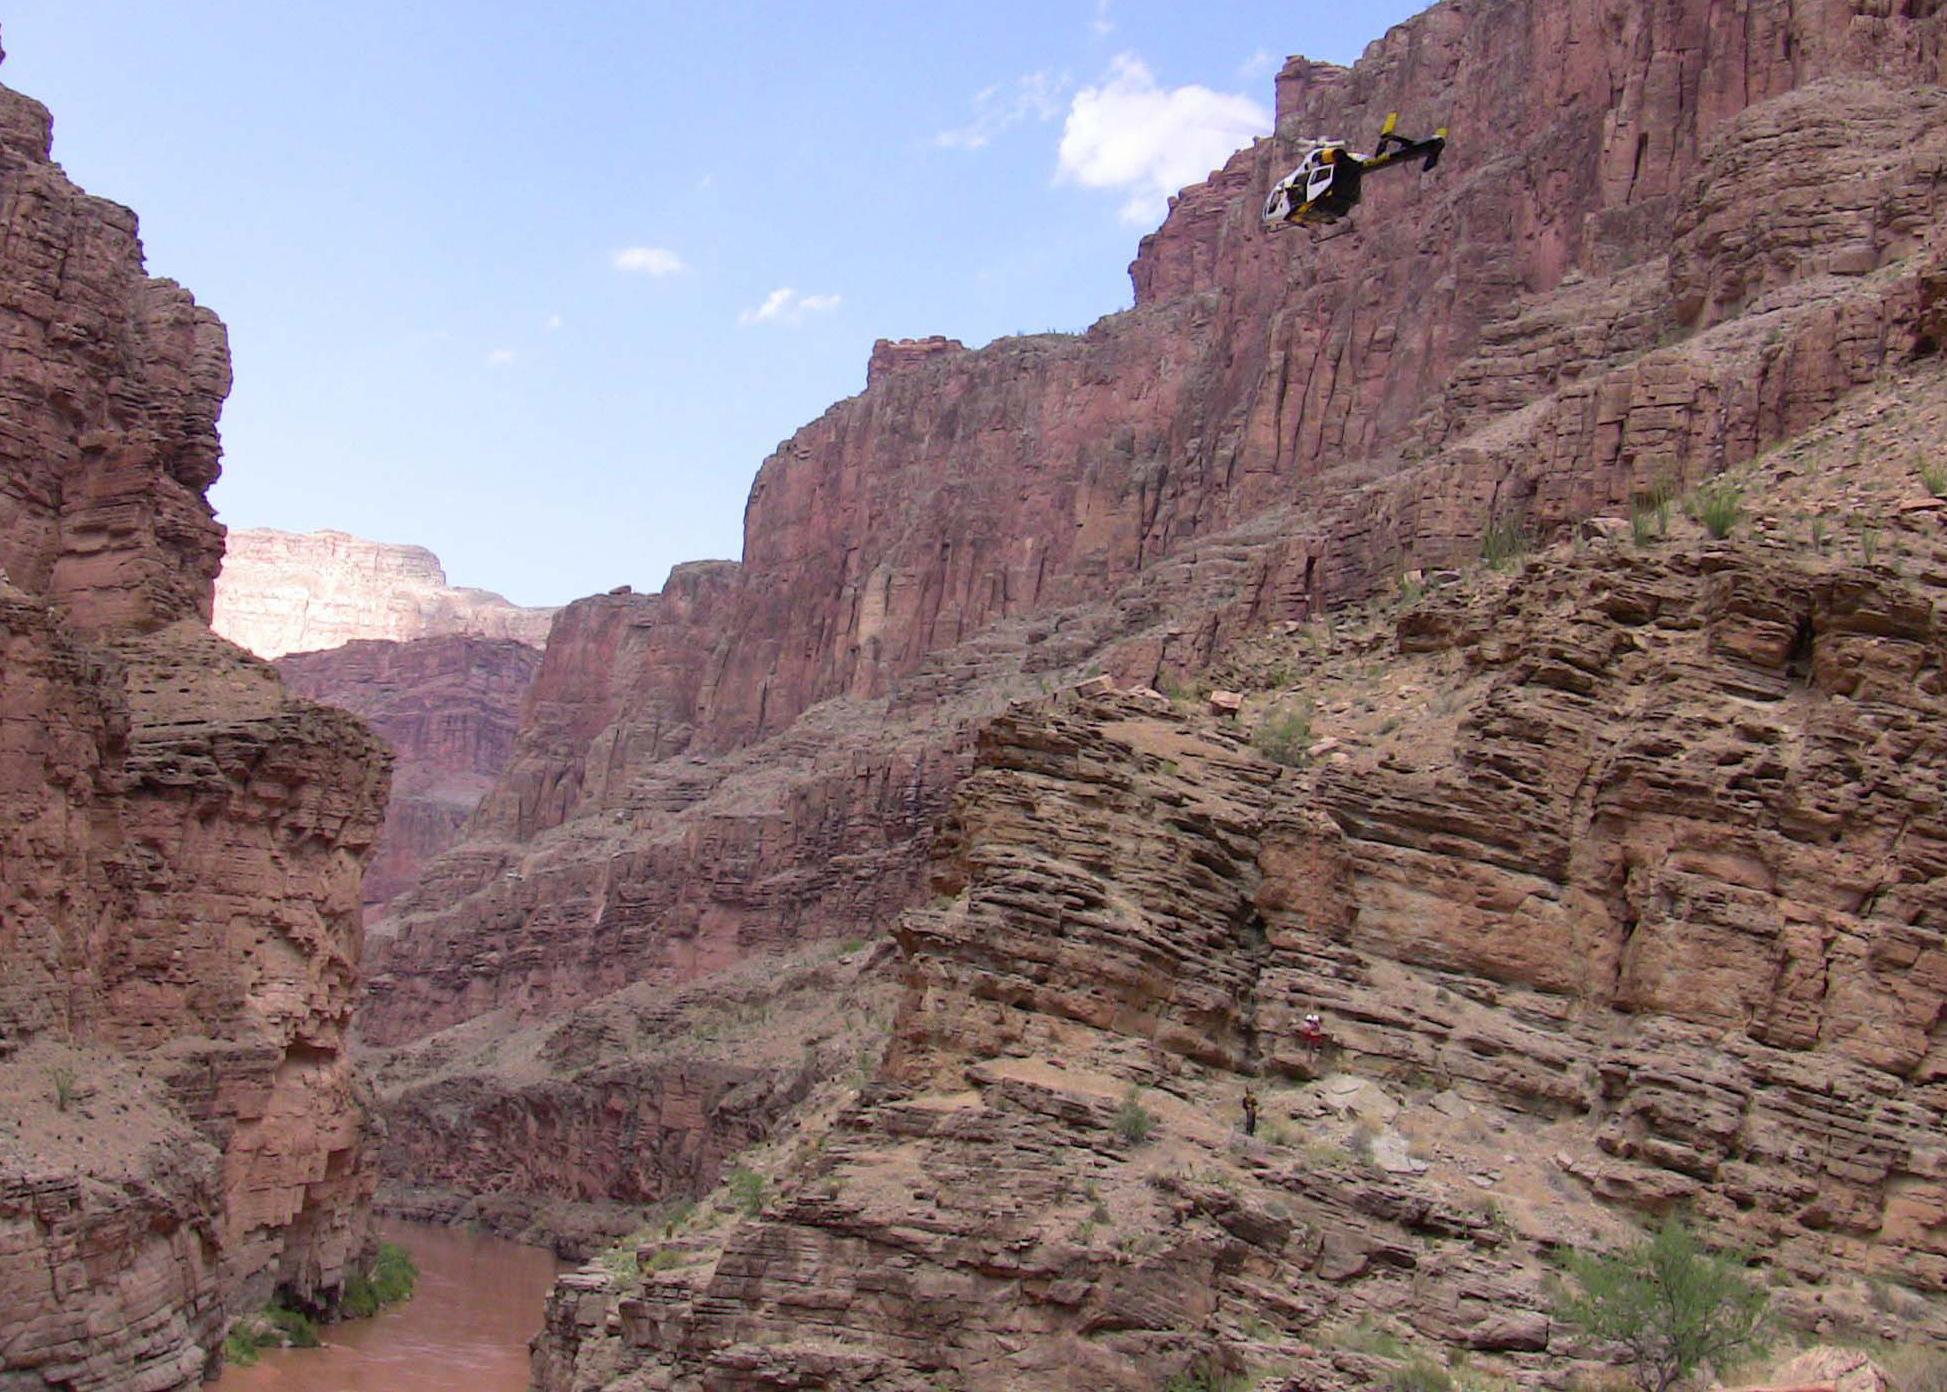 Flooding_Grand_Canyon_09664-159532.jpg05175010